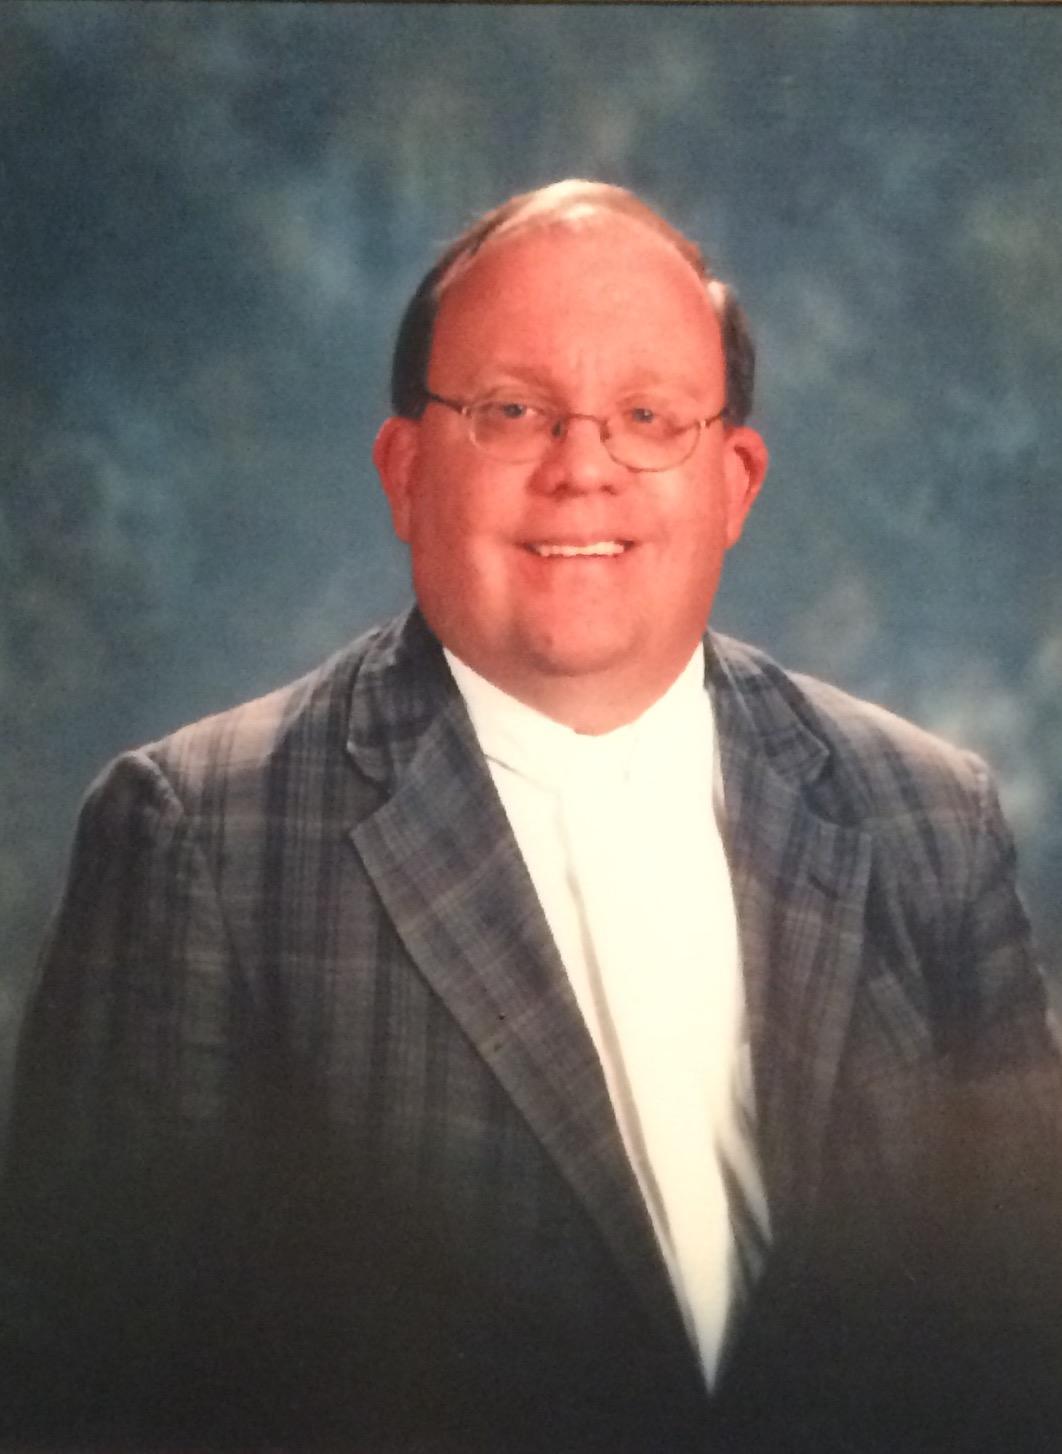 The Rev. Leonard J. Shatkus Jr.